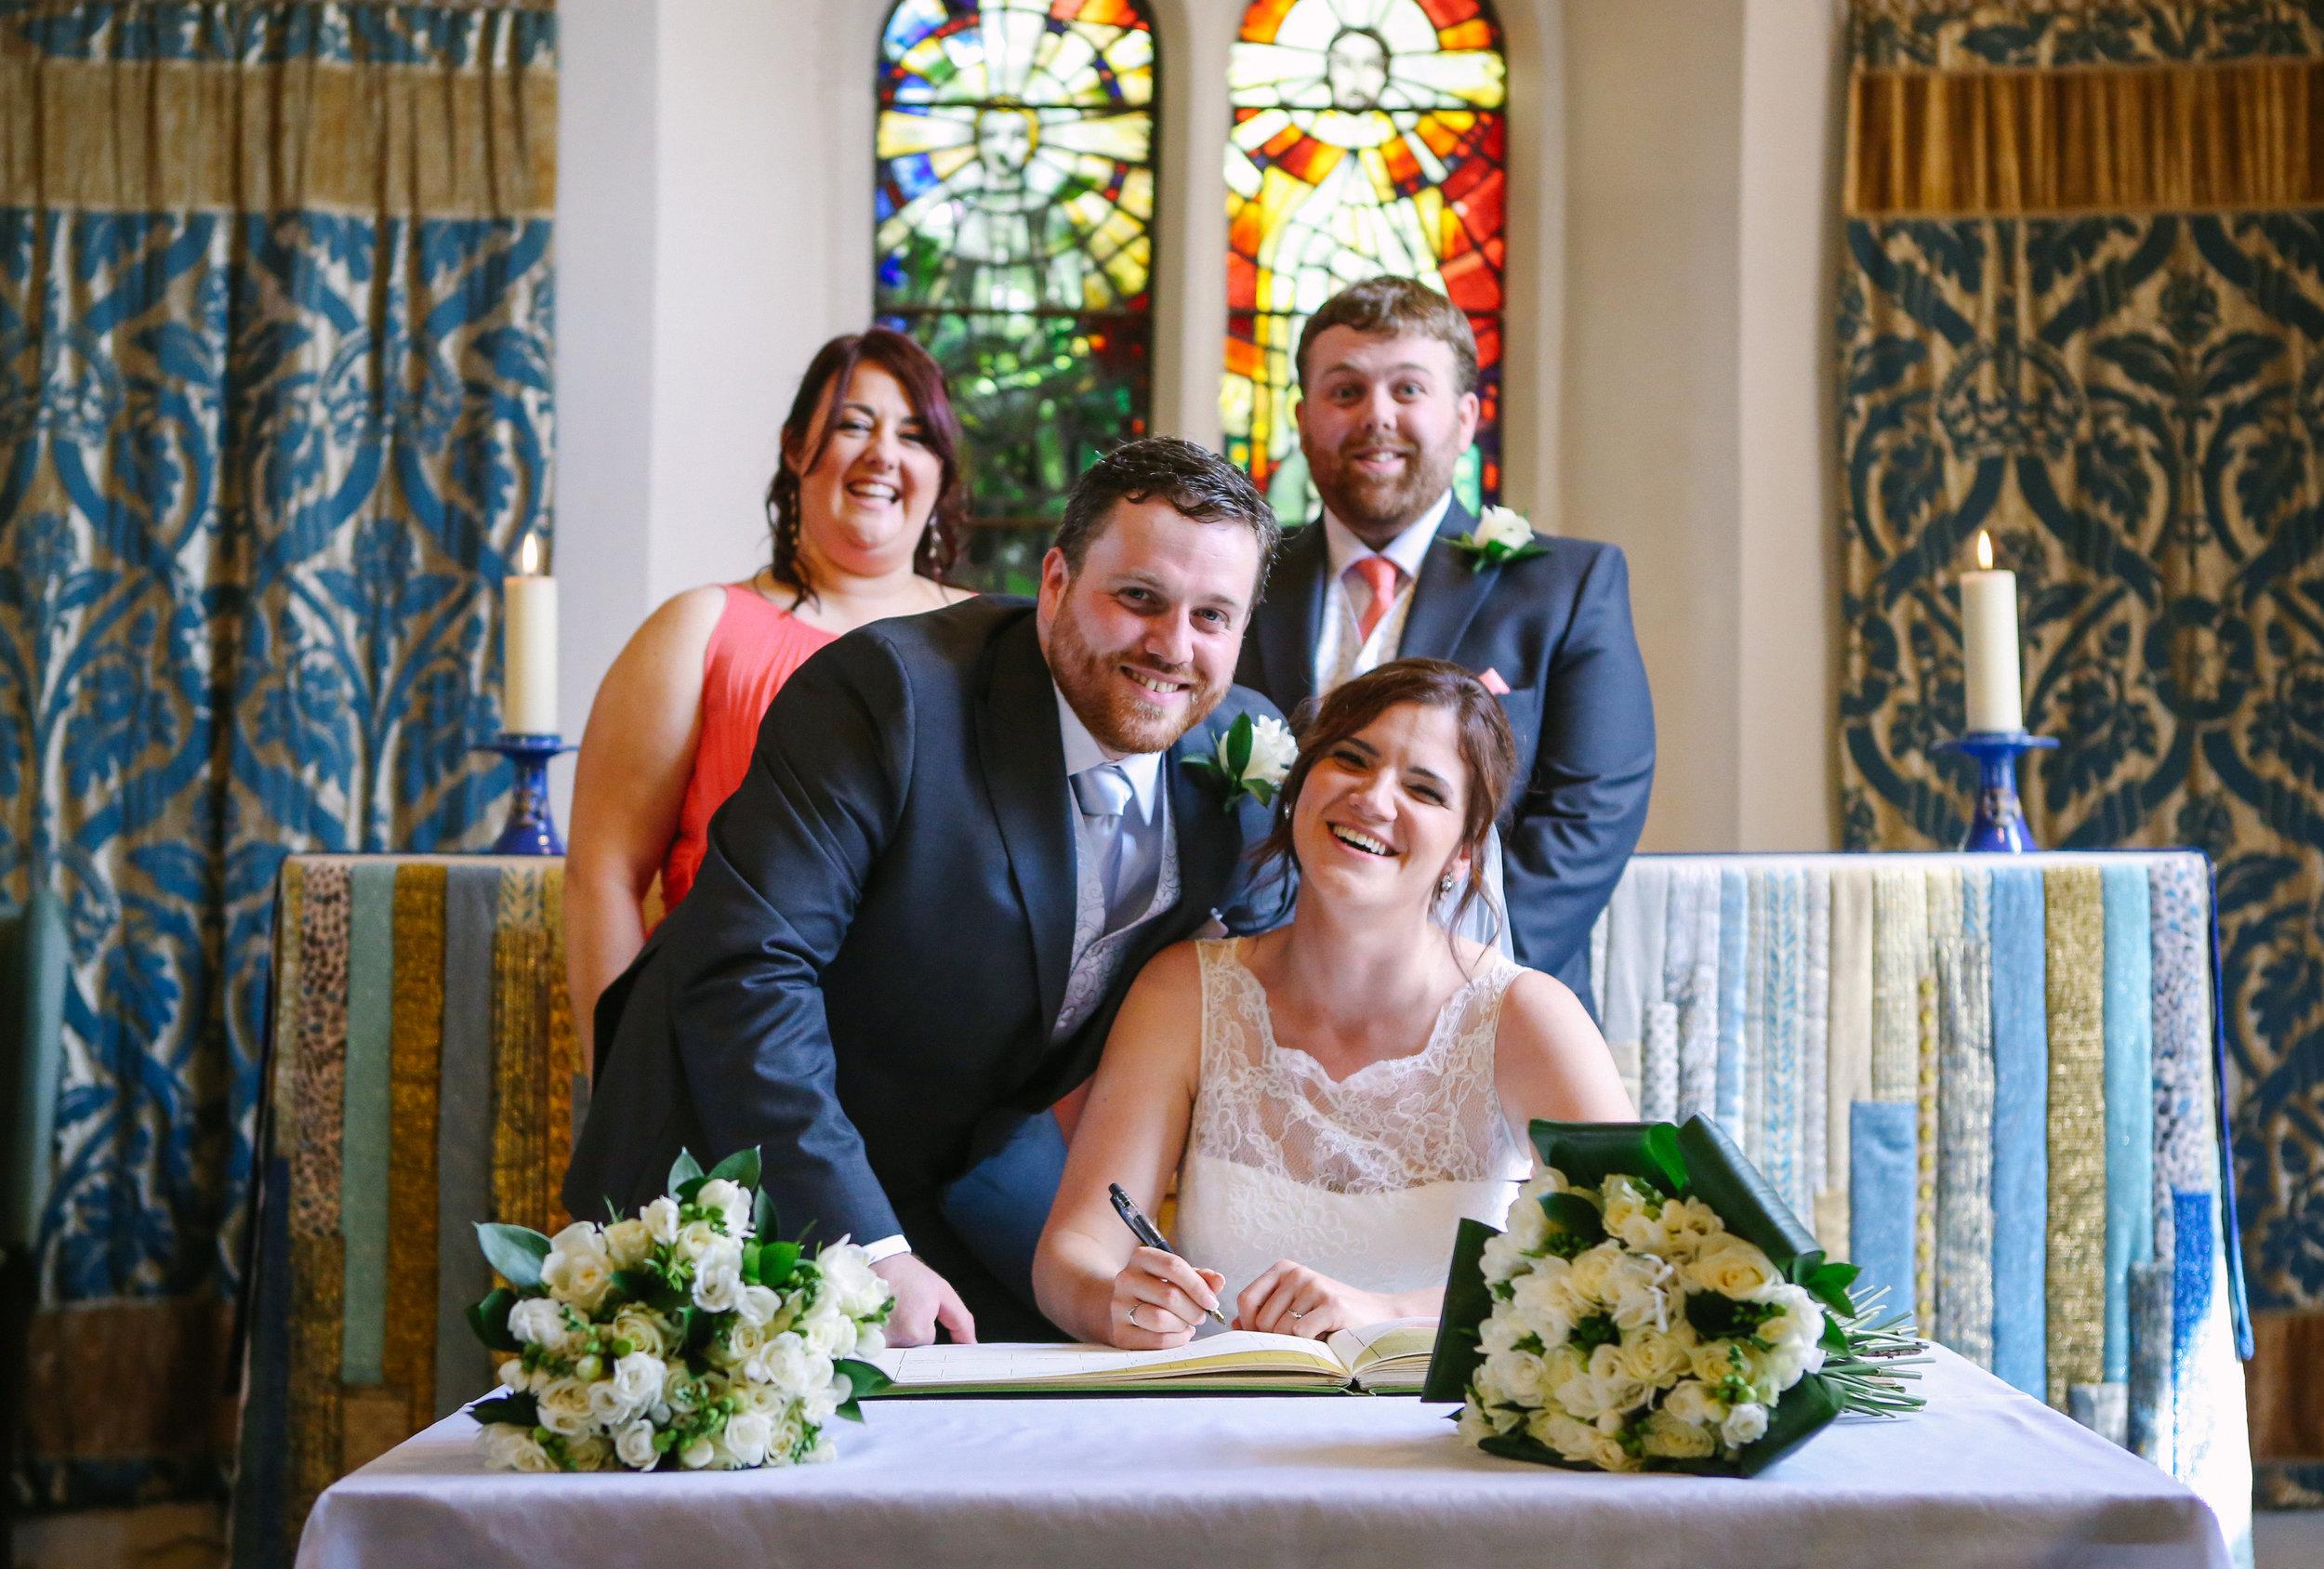 reigate-surrey-london-wedding-photography-signing-register-57